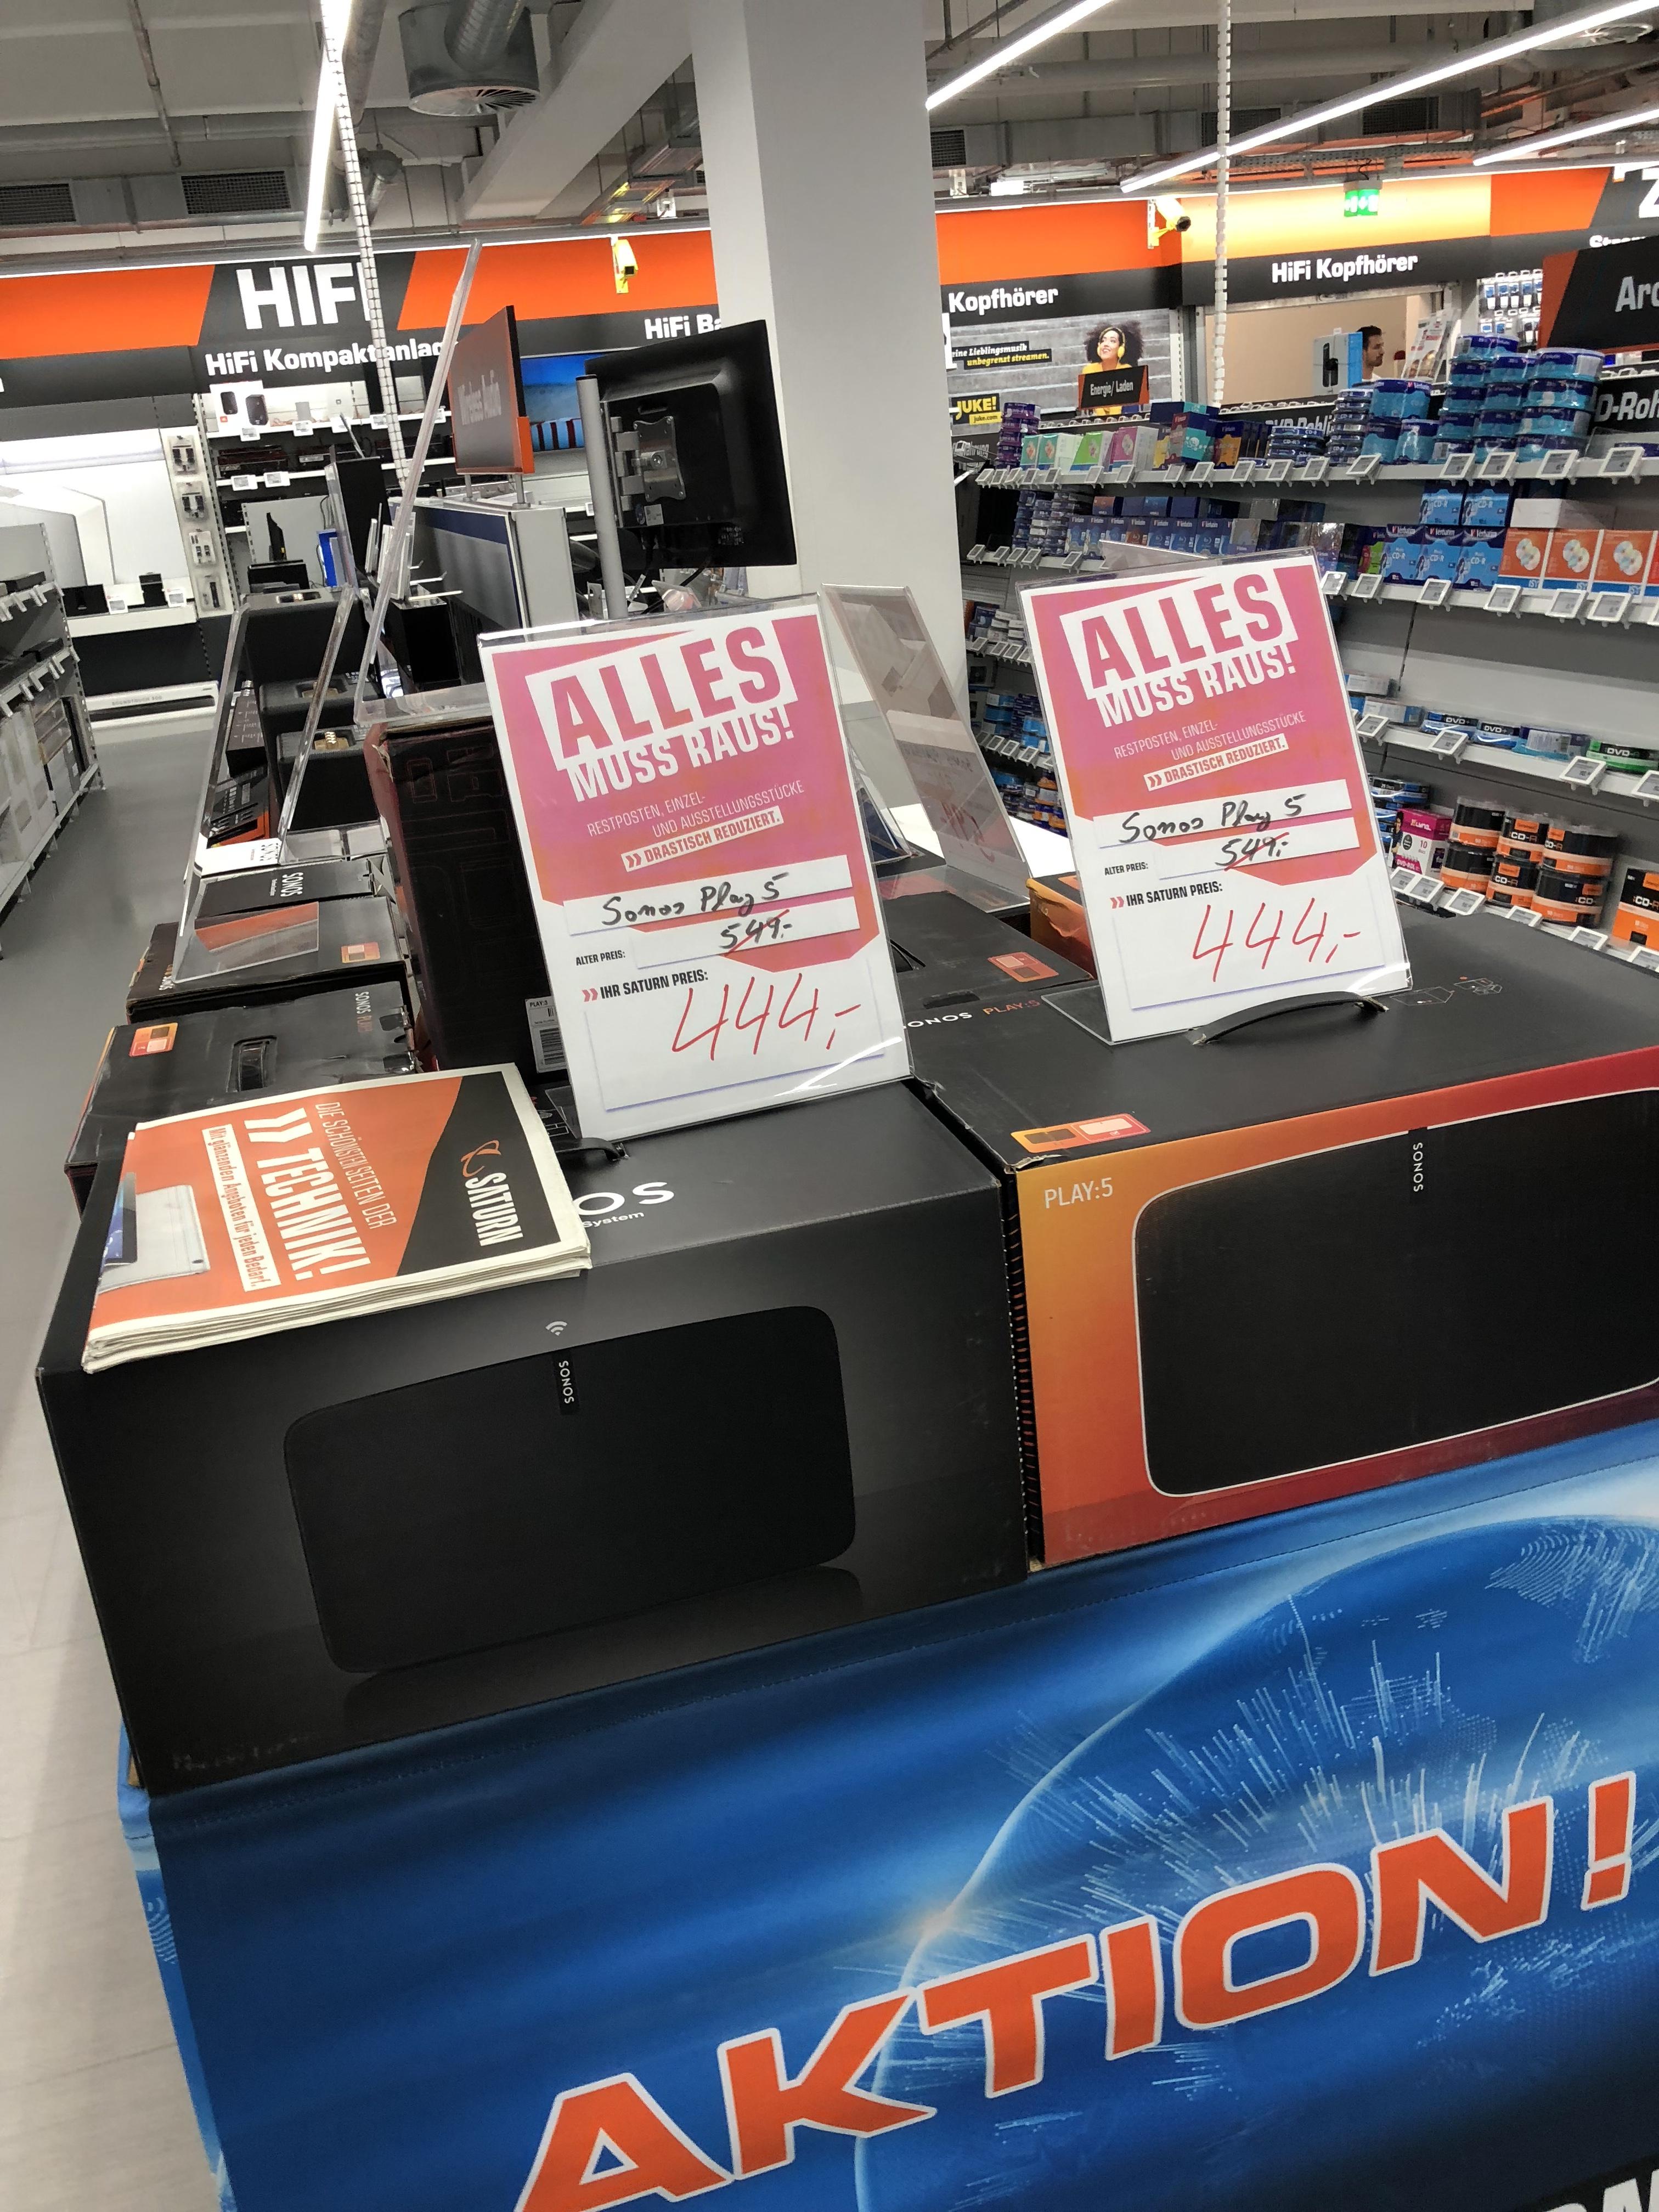 [Lokal] Sonos Play 5 (444€) + PlayBase (599€) im Saturn Bielefeld